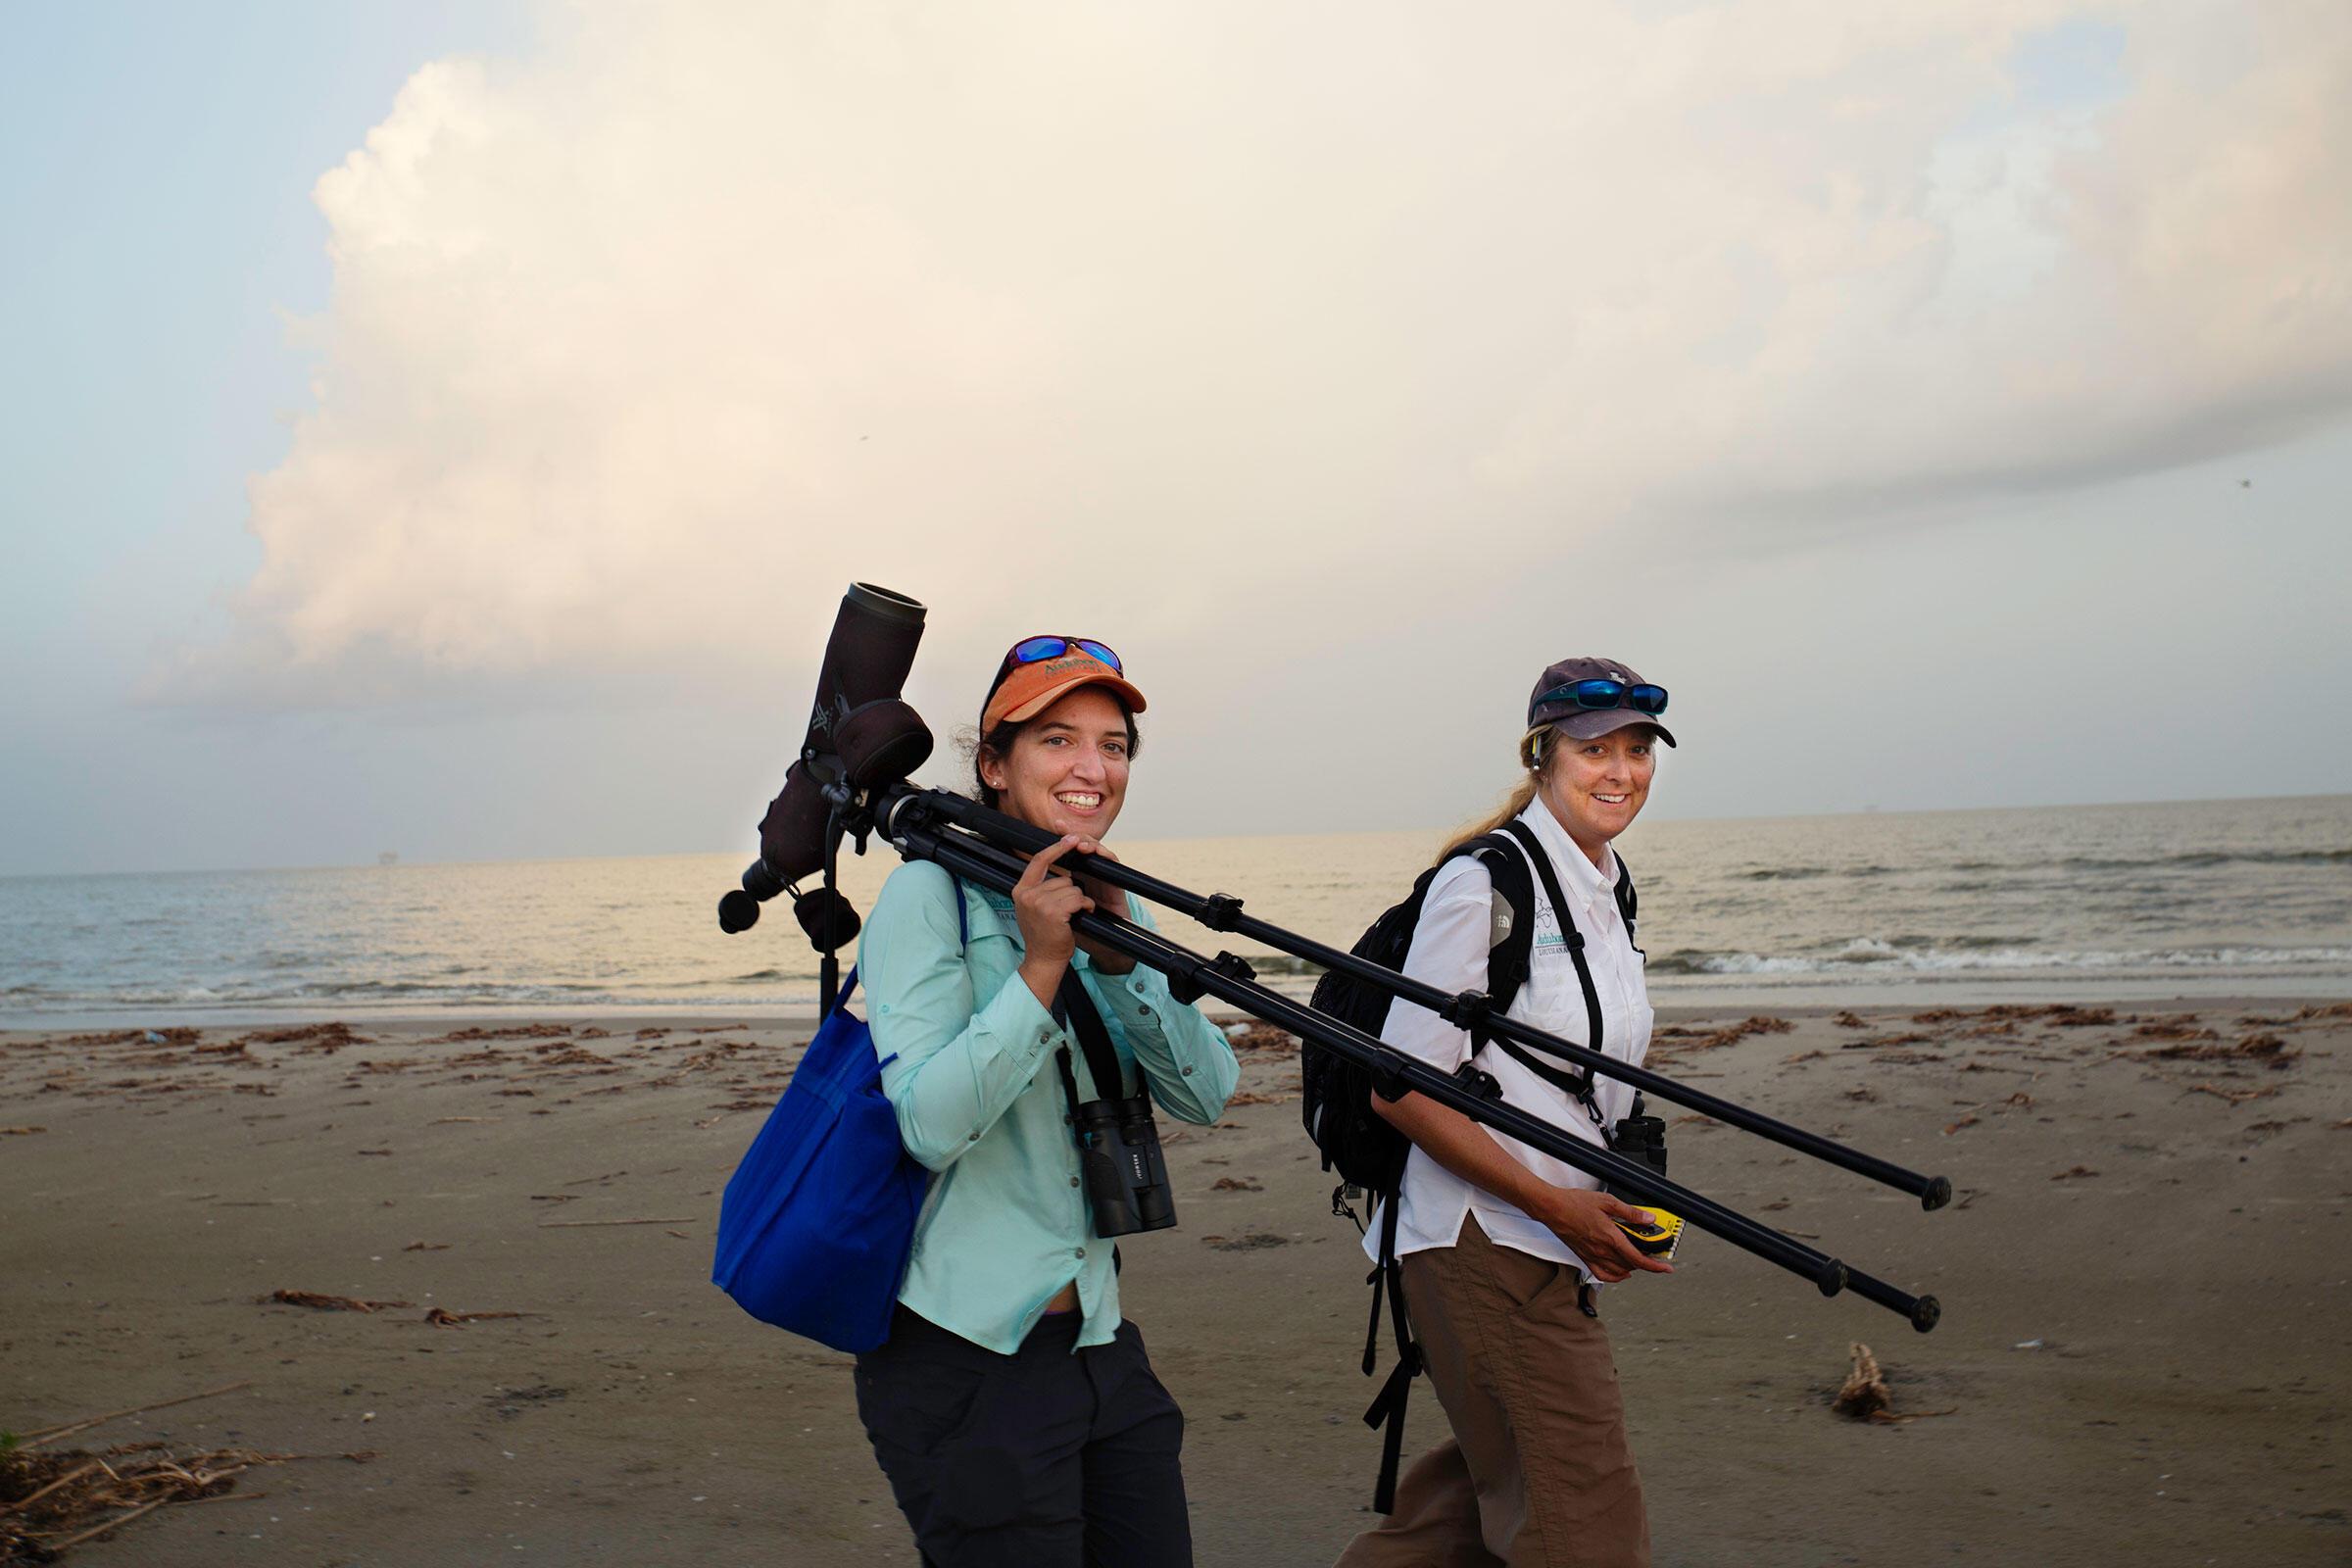 Audubon Lousiana wildlife techs Sarah Bolinger (left) and Melinda Averhart monitor birds on newly restored beaches. Mike Fernandez/Audubon